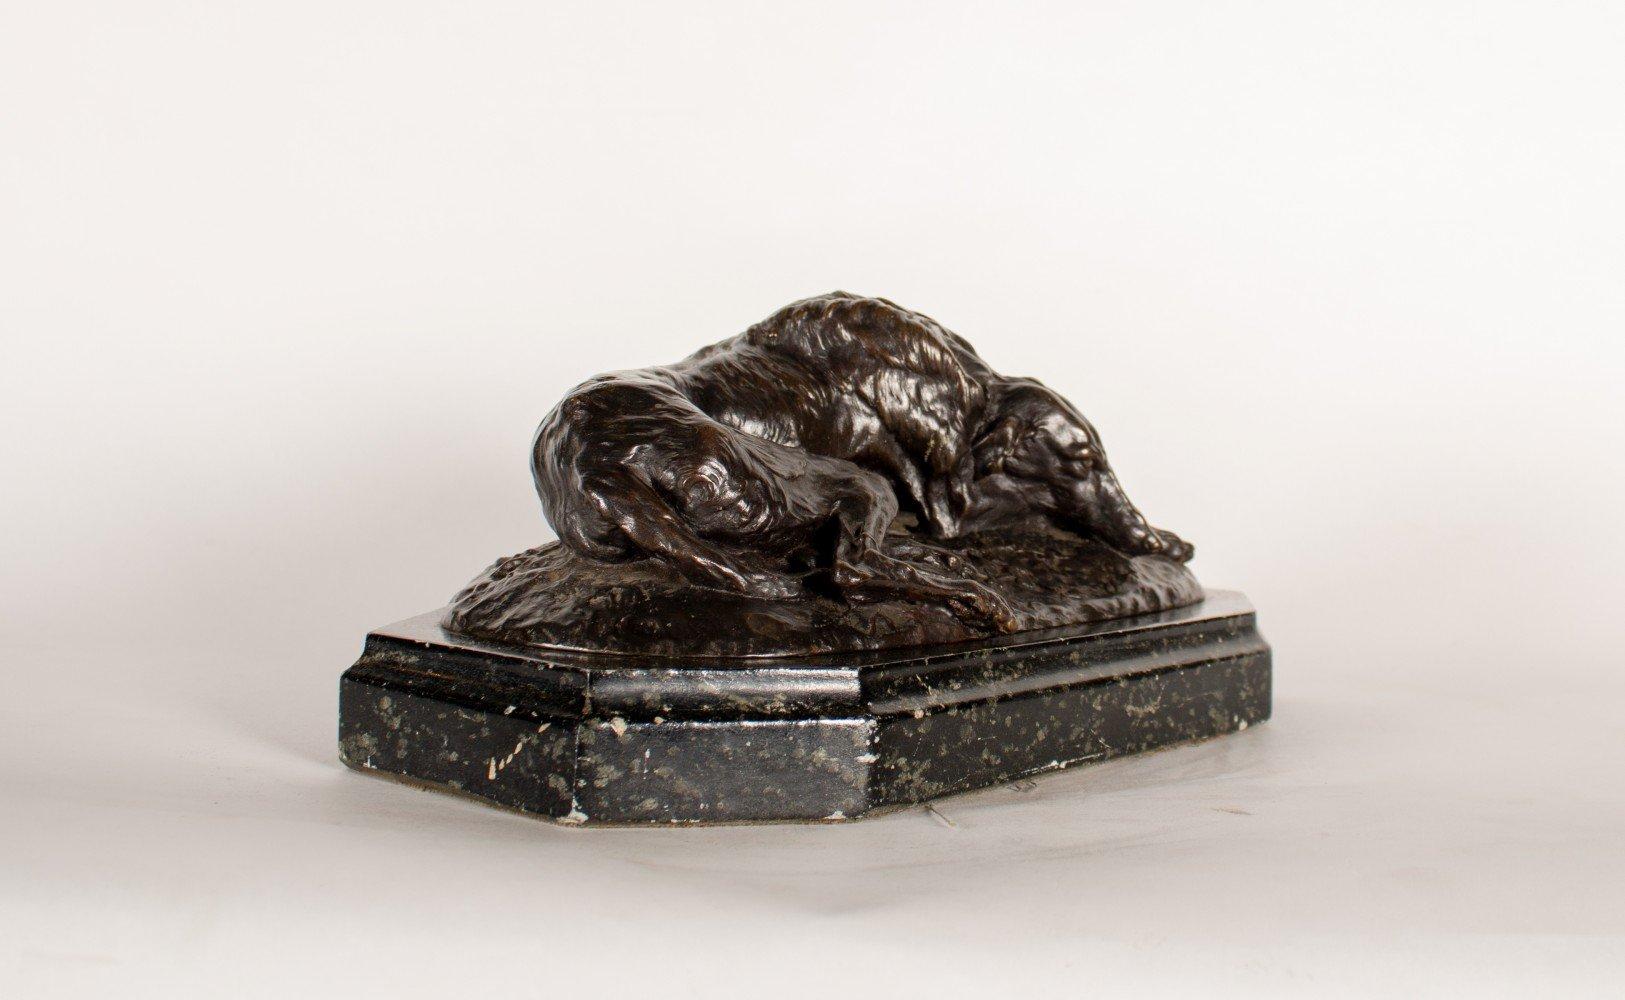 Scottish Deerhound by Joseph Paul Raymond Gayrard